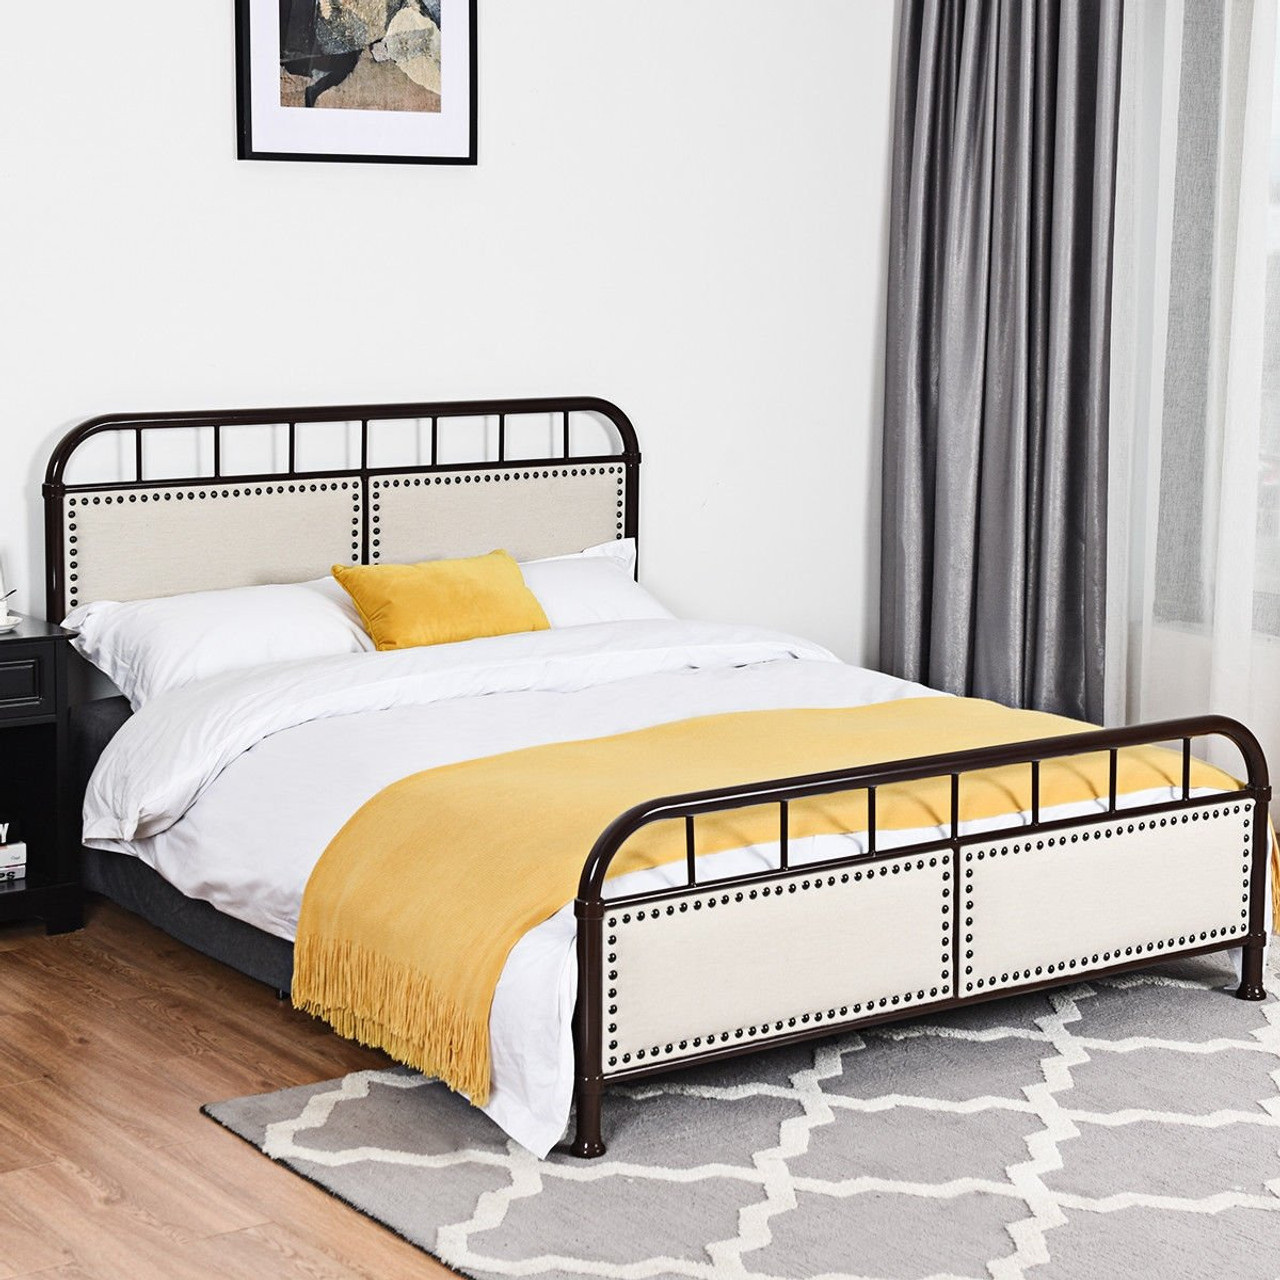 Image of: Queen Size Metal Bed Frame Platform Bed Upholstered Panel Headboard Footboard Black Hw59207bk By Cw